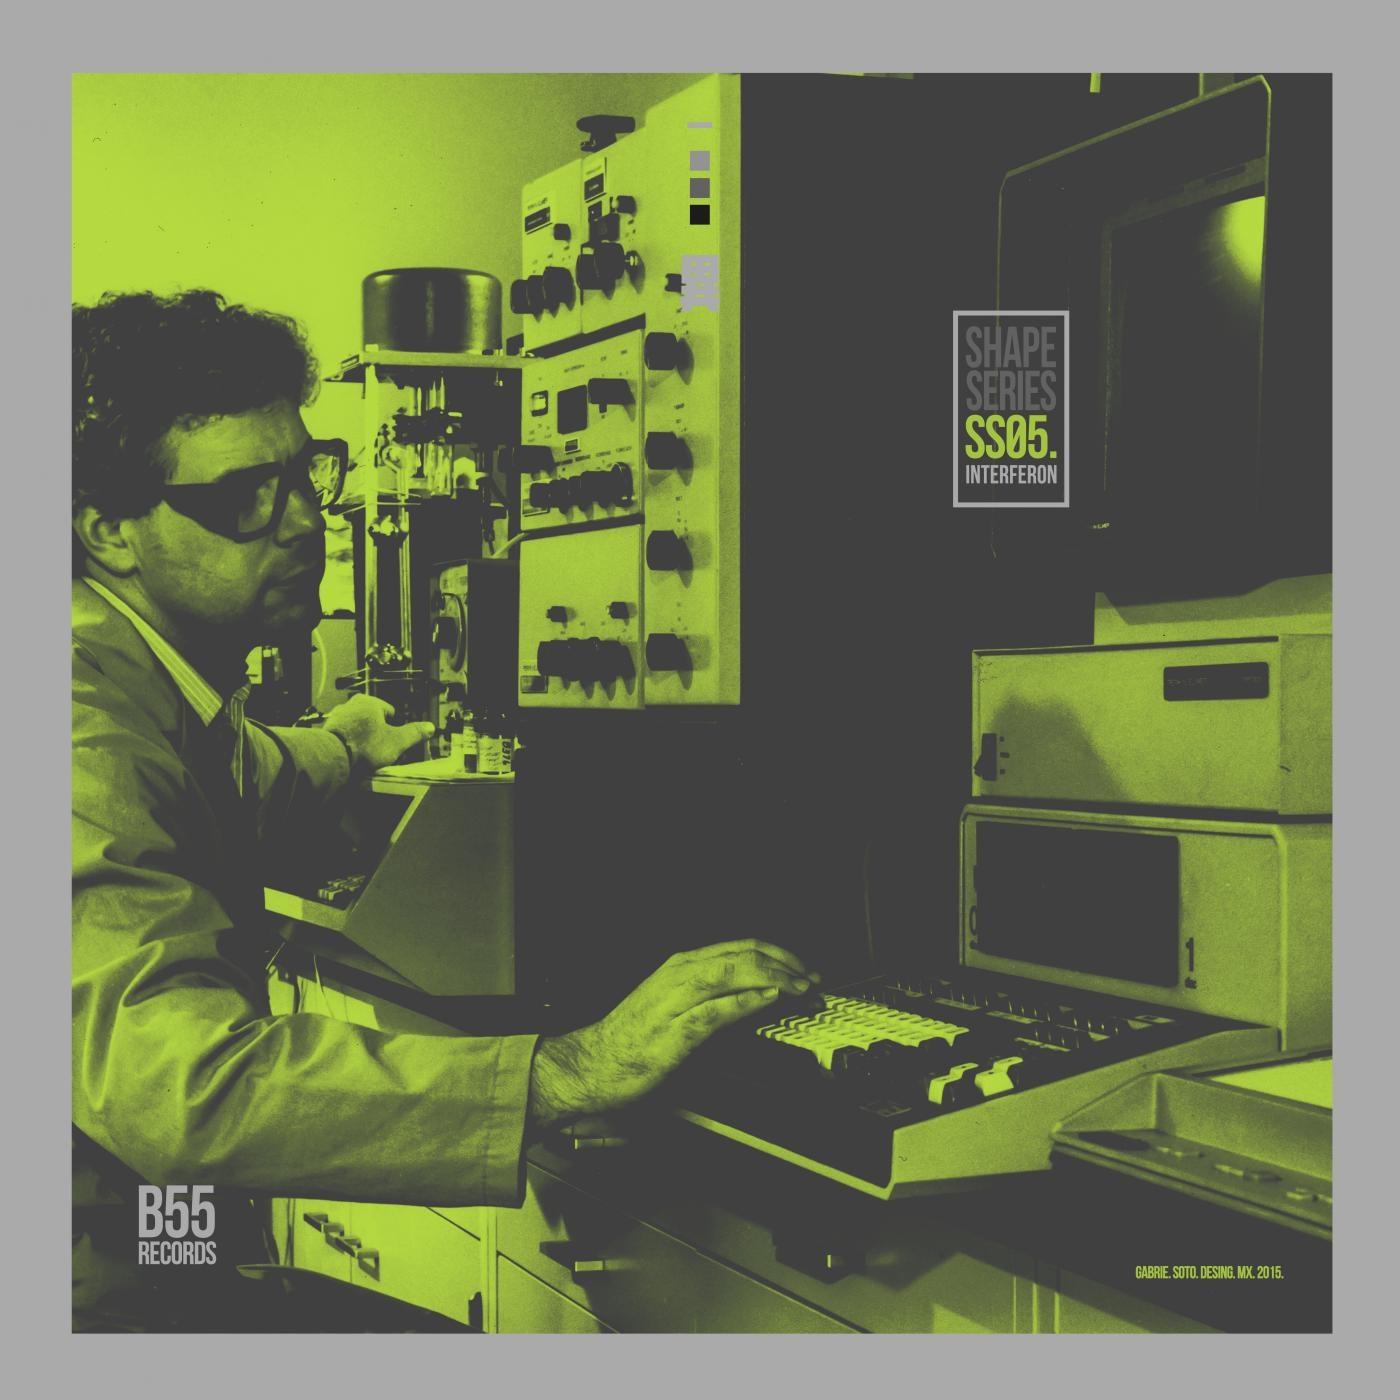 INTERFERON - Hive (Original mix)